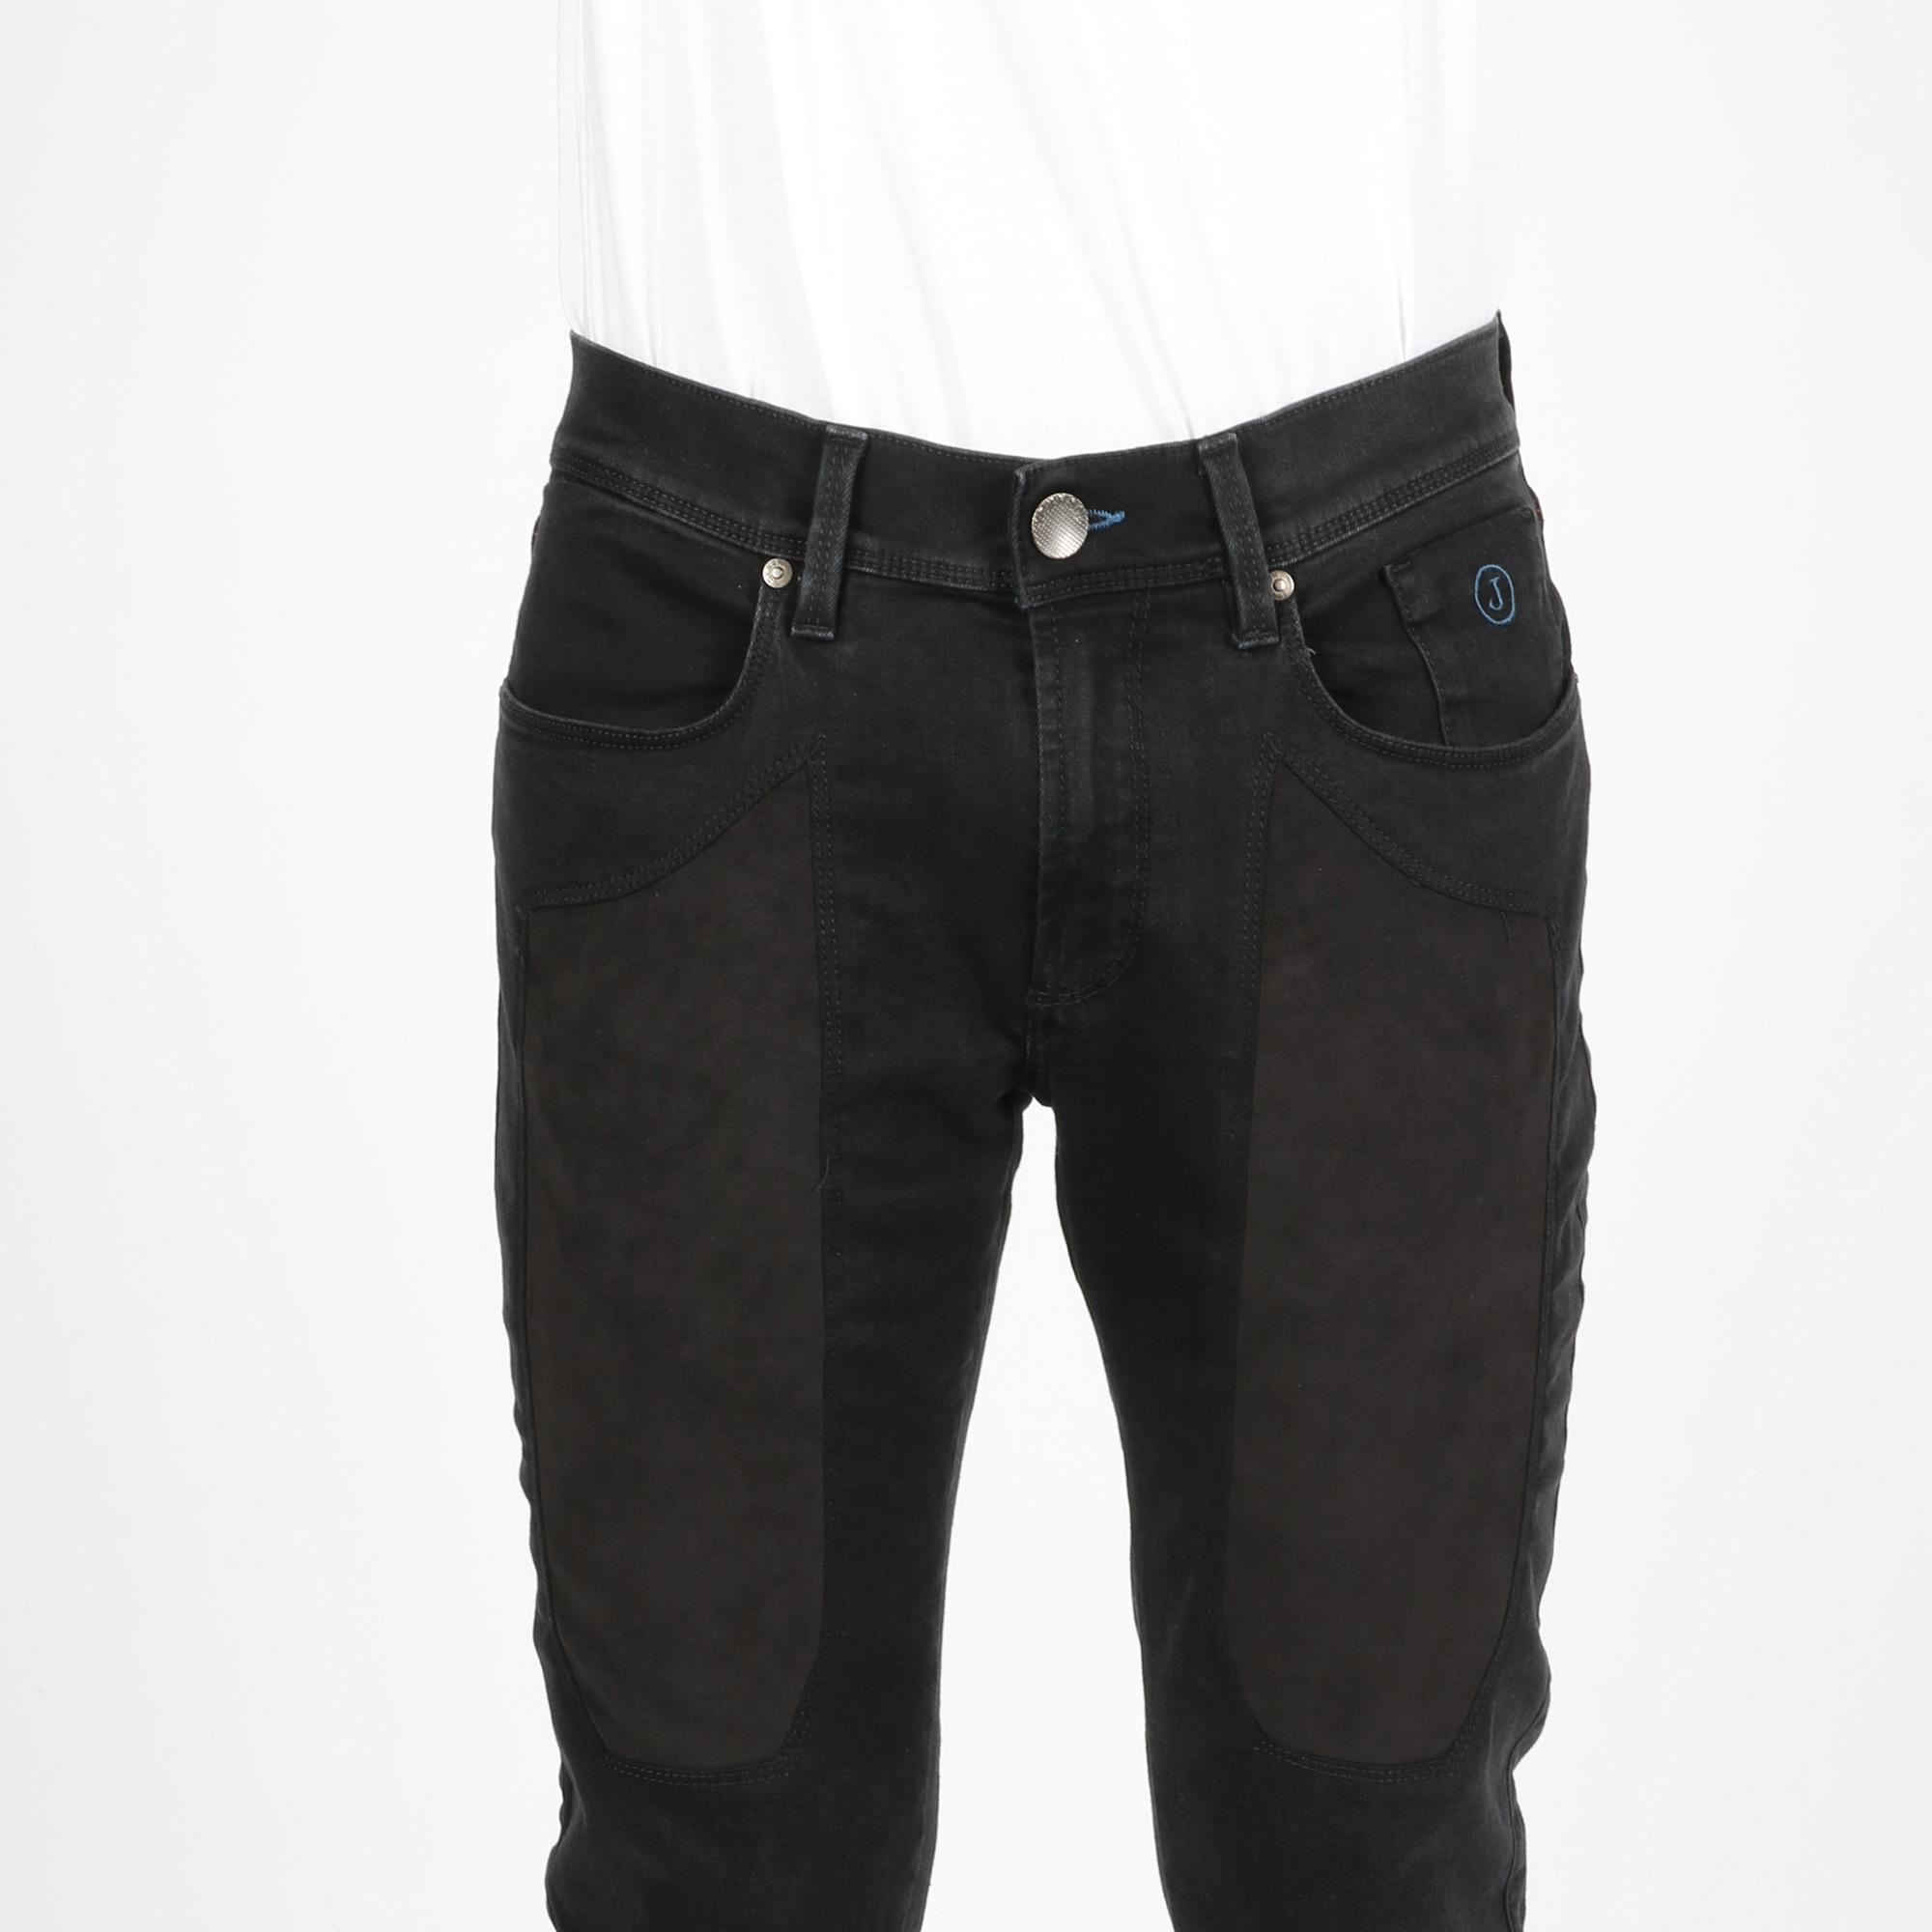 Jeans toppa nera - Denim nero